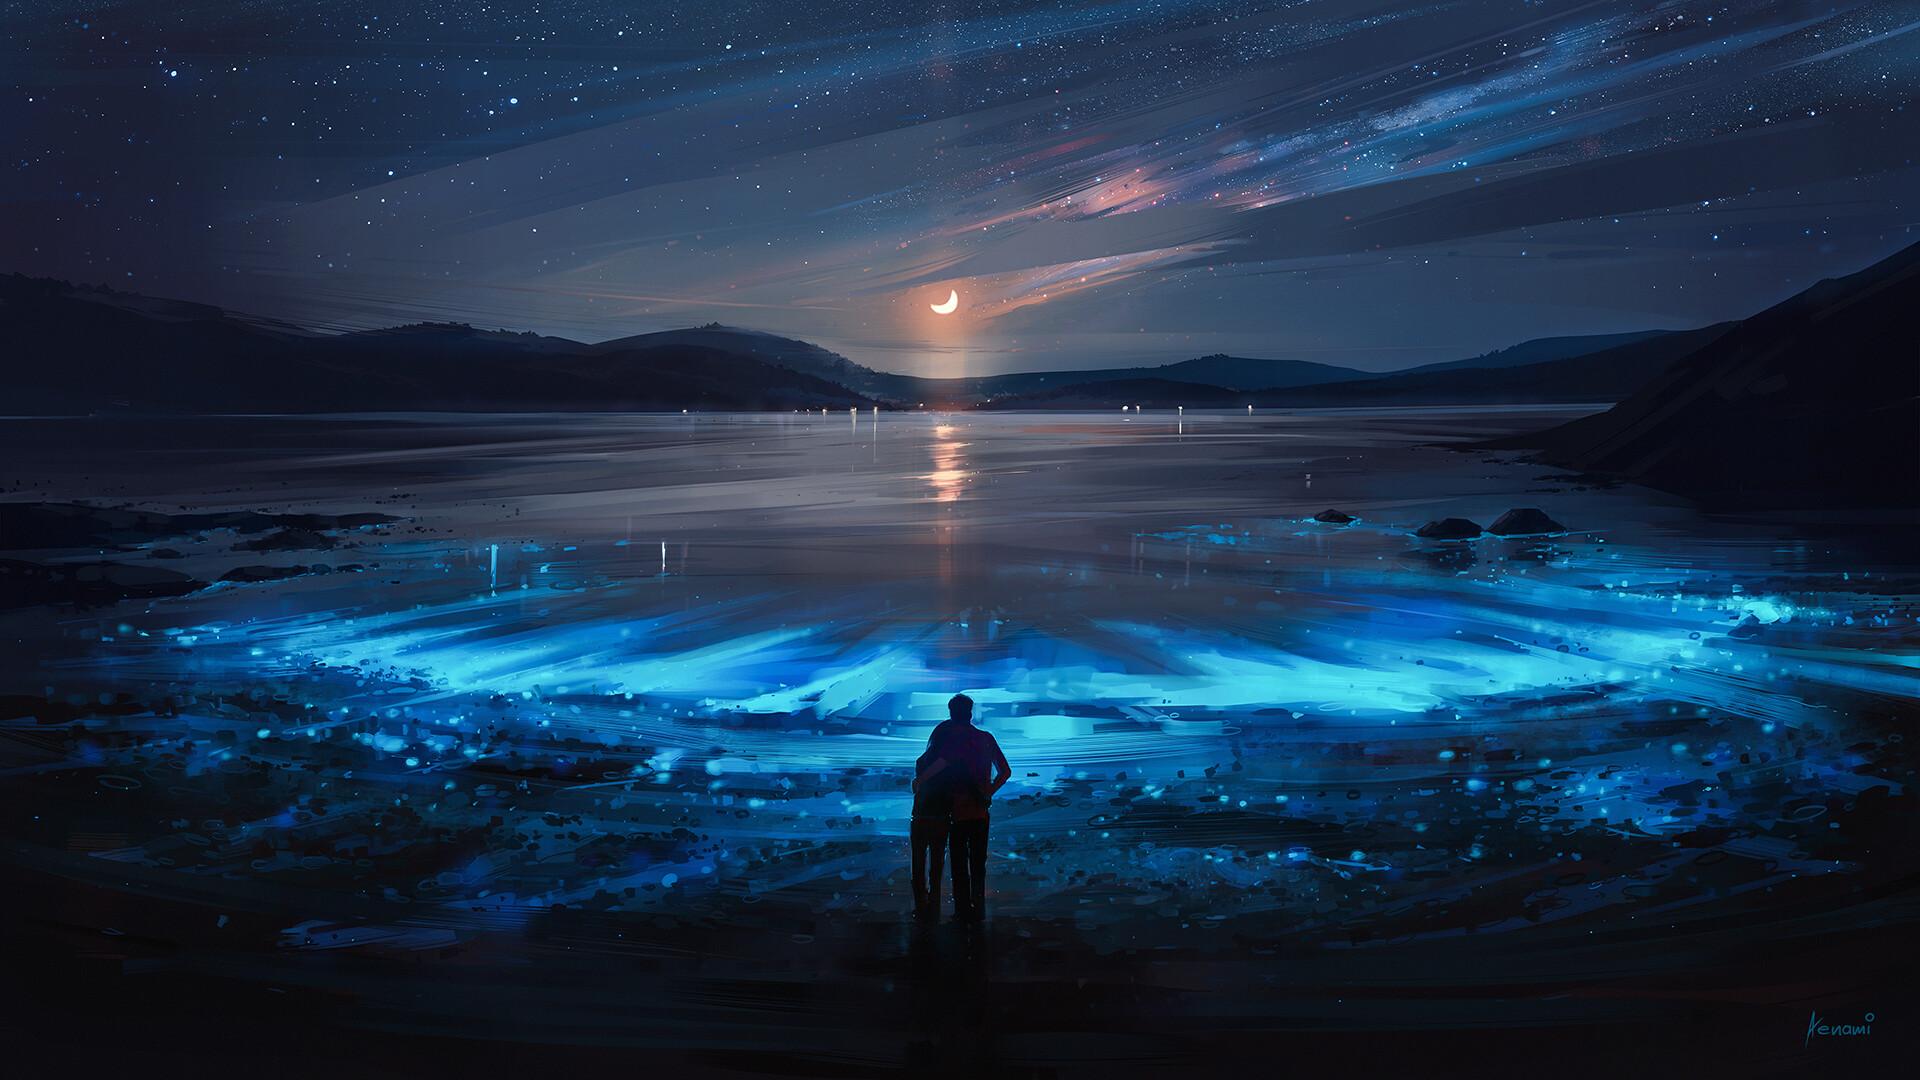 General 1920x1080 Aenami painting digital art night landscape blue